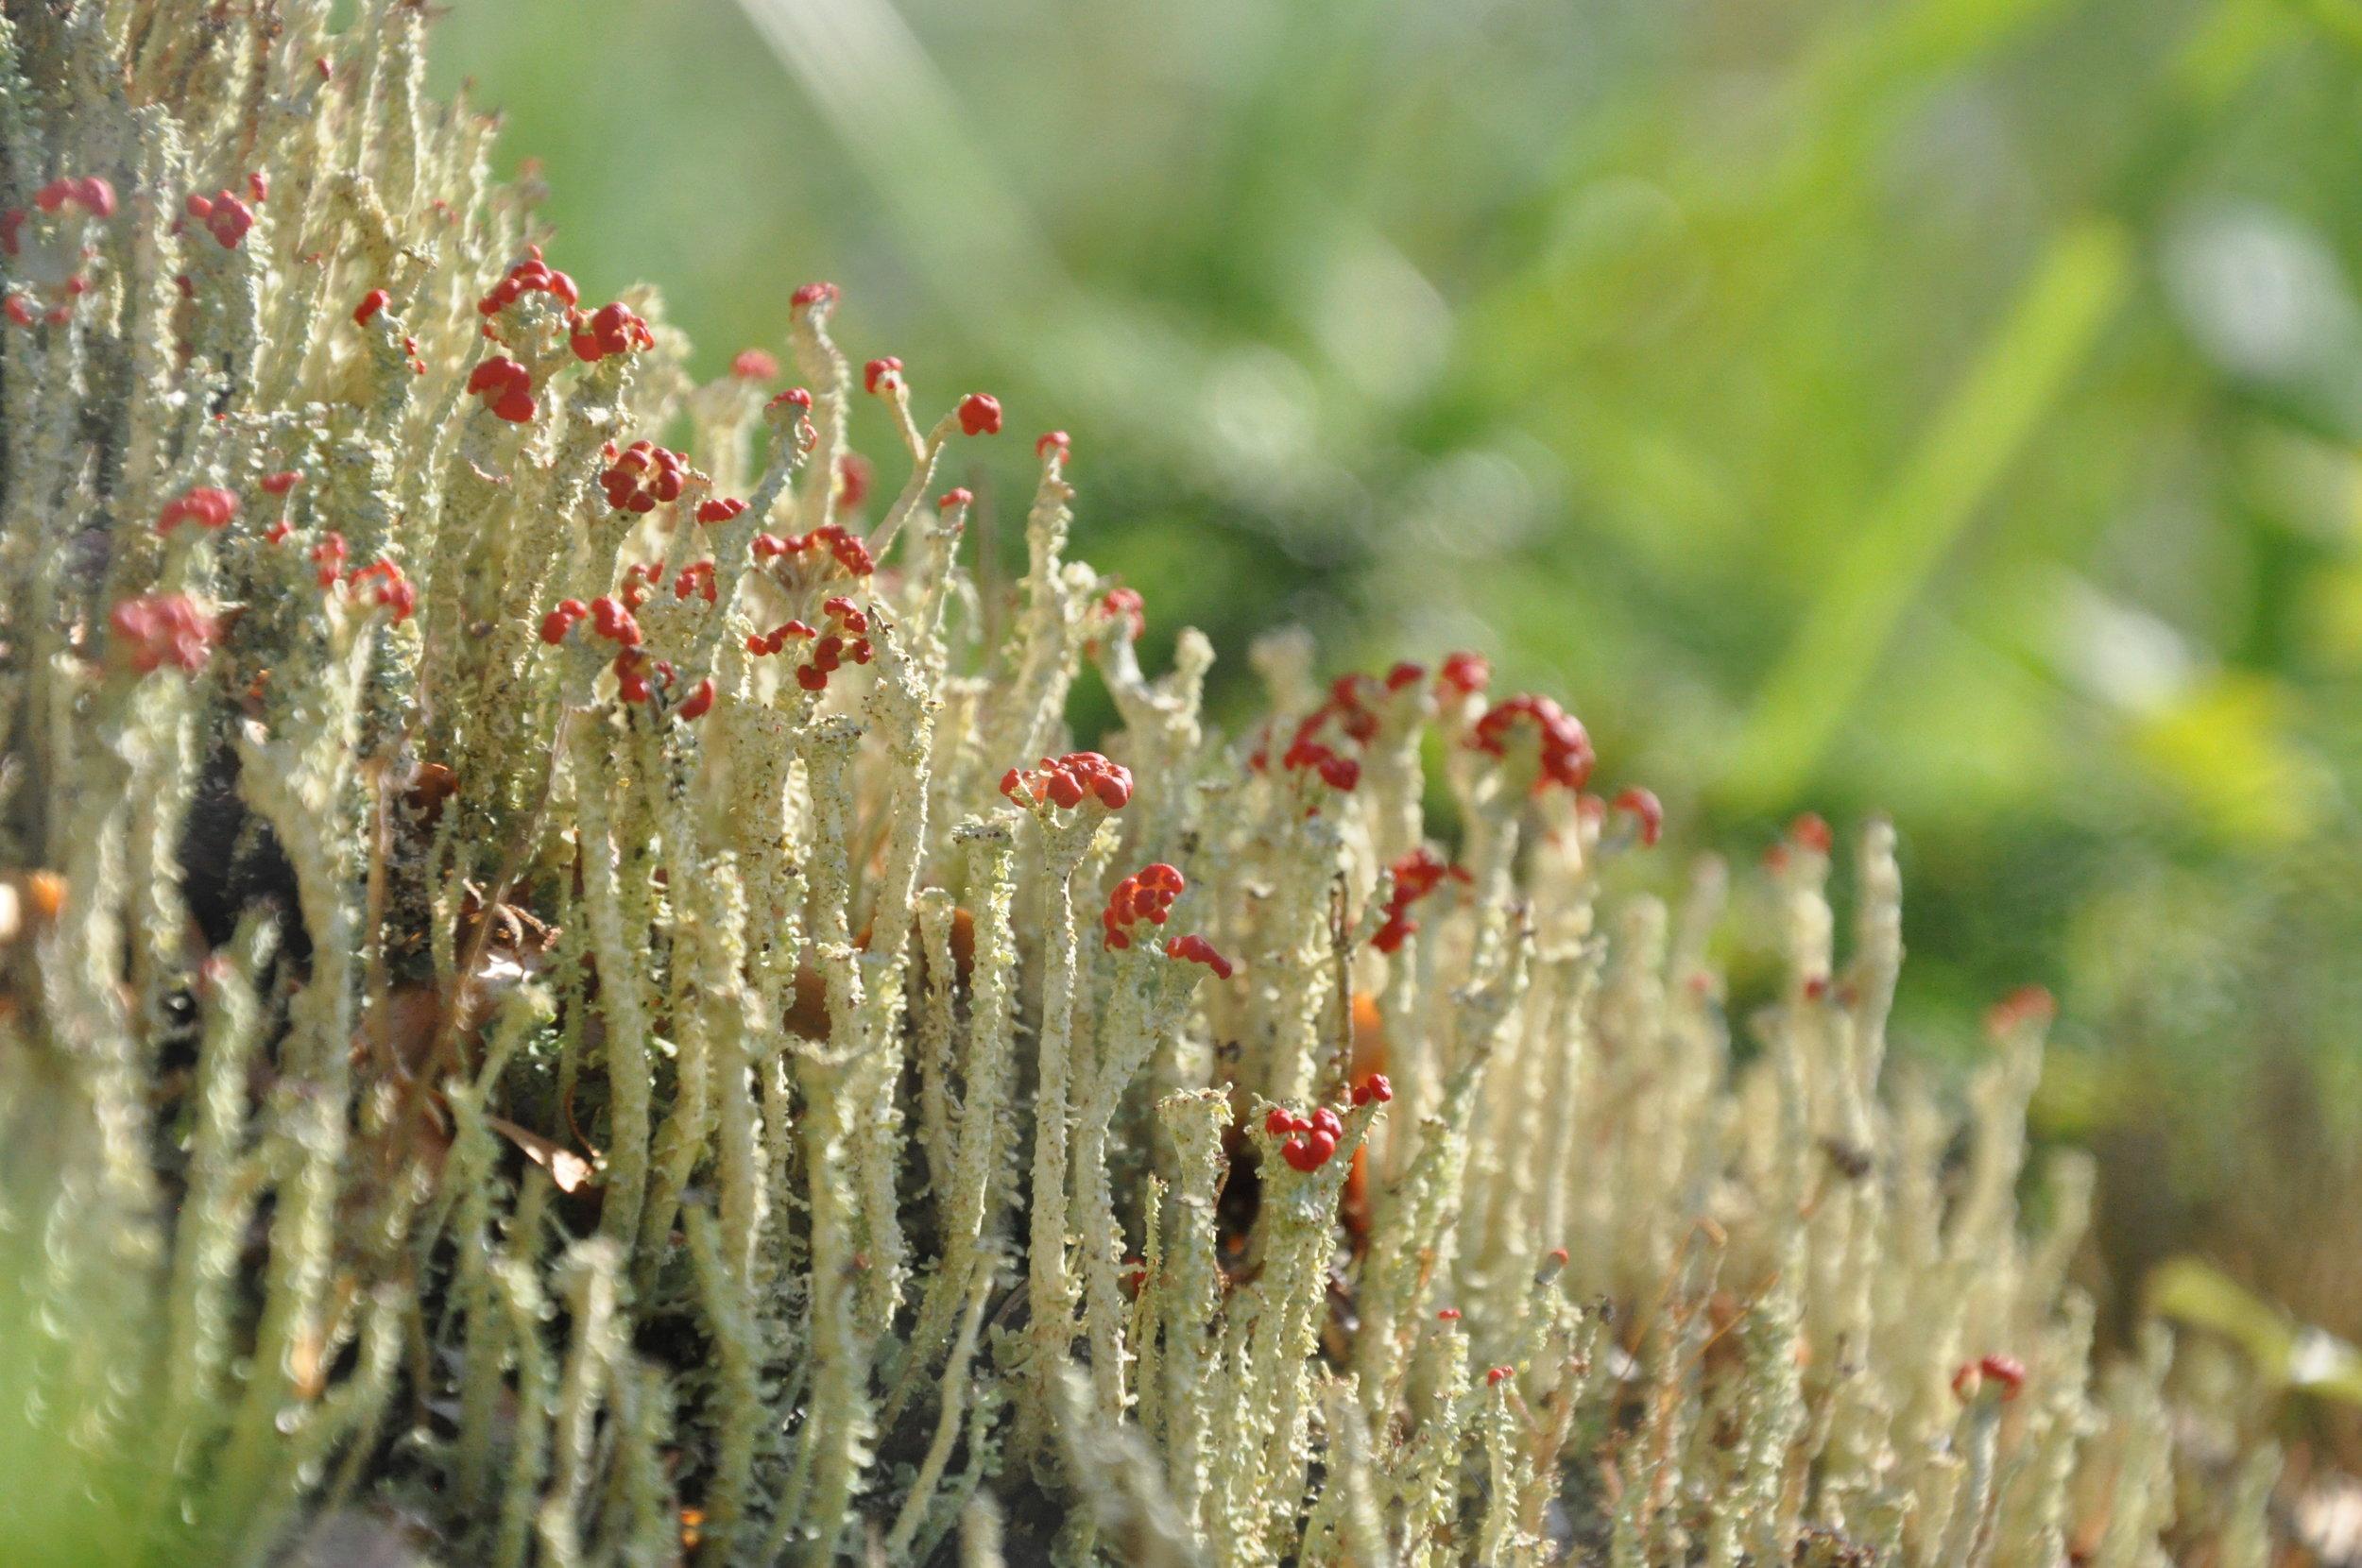 A fruticose lichen in Aialik Bay, Alaska